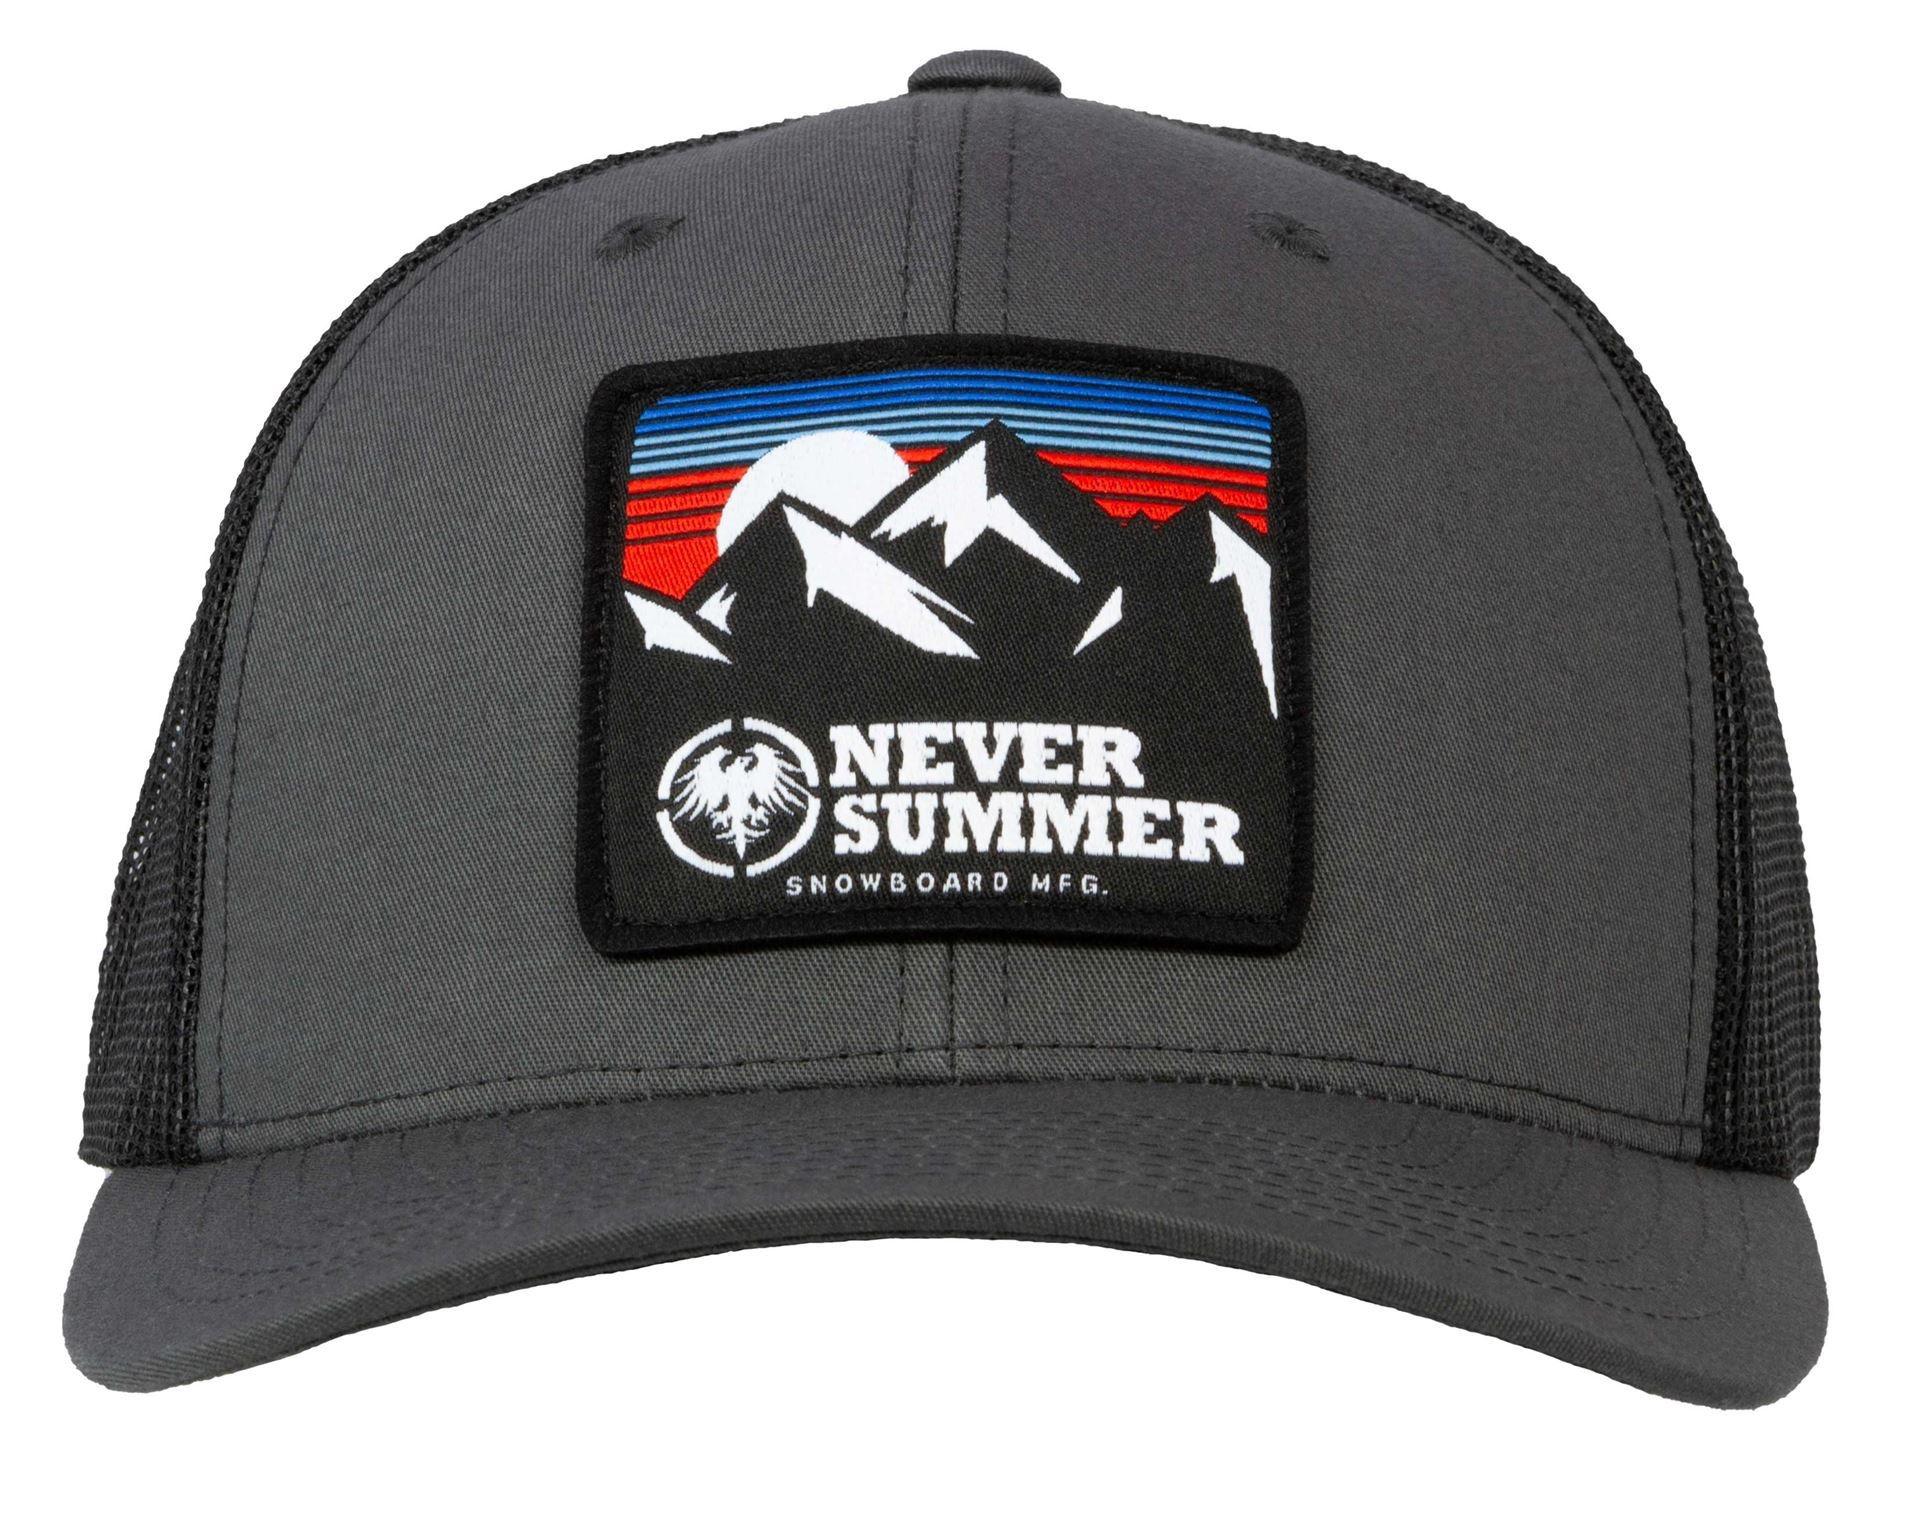 Retro Mountain Mesh Snapback Charcoal/Black